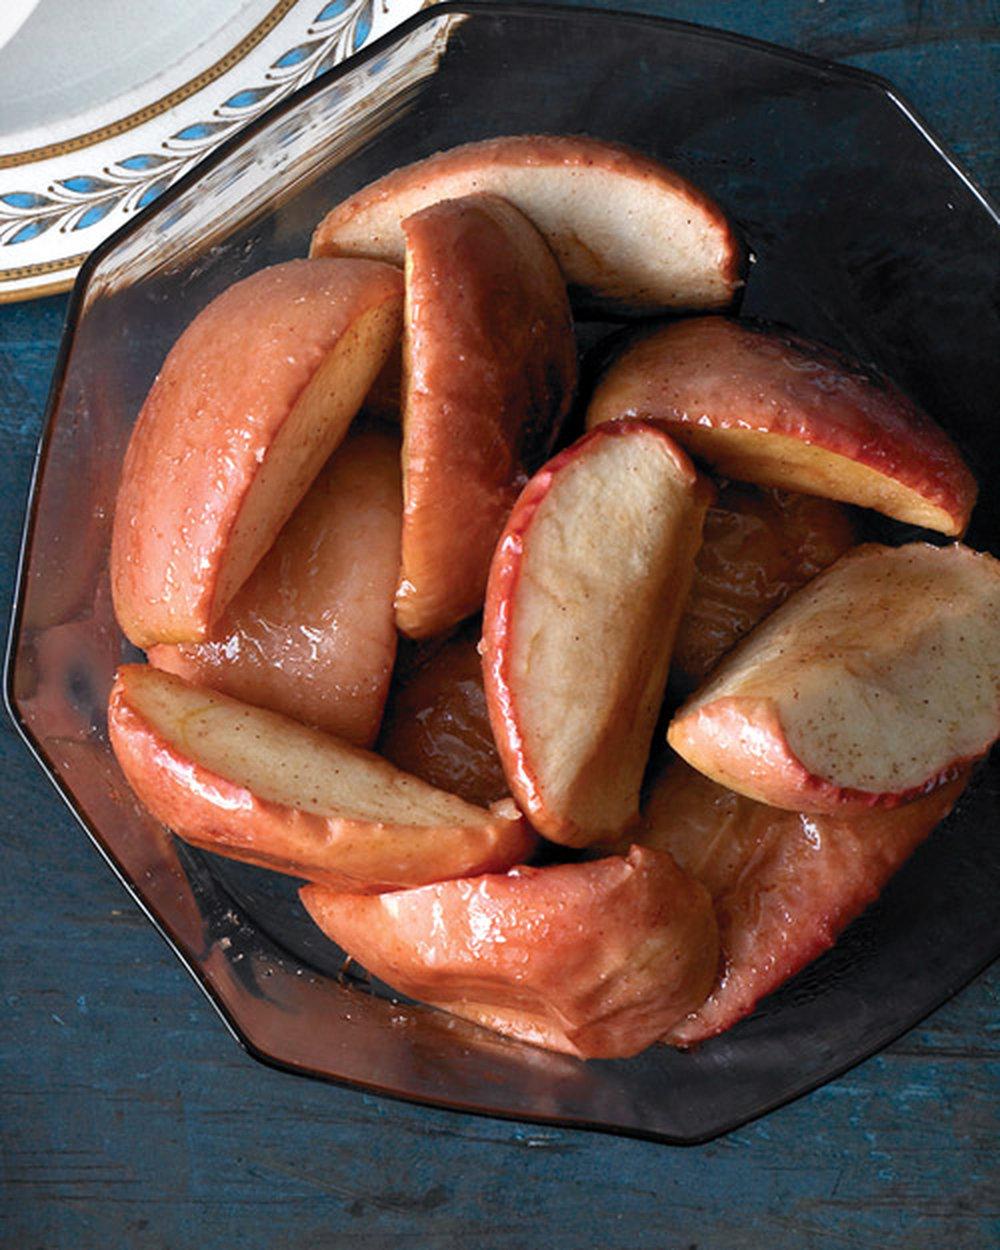 mld105100_1209_1209_roast_apples_hd.jpg